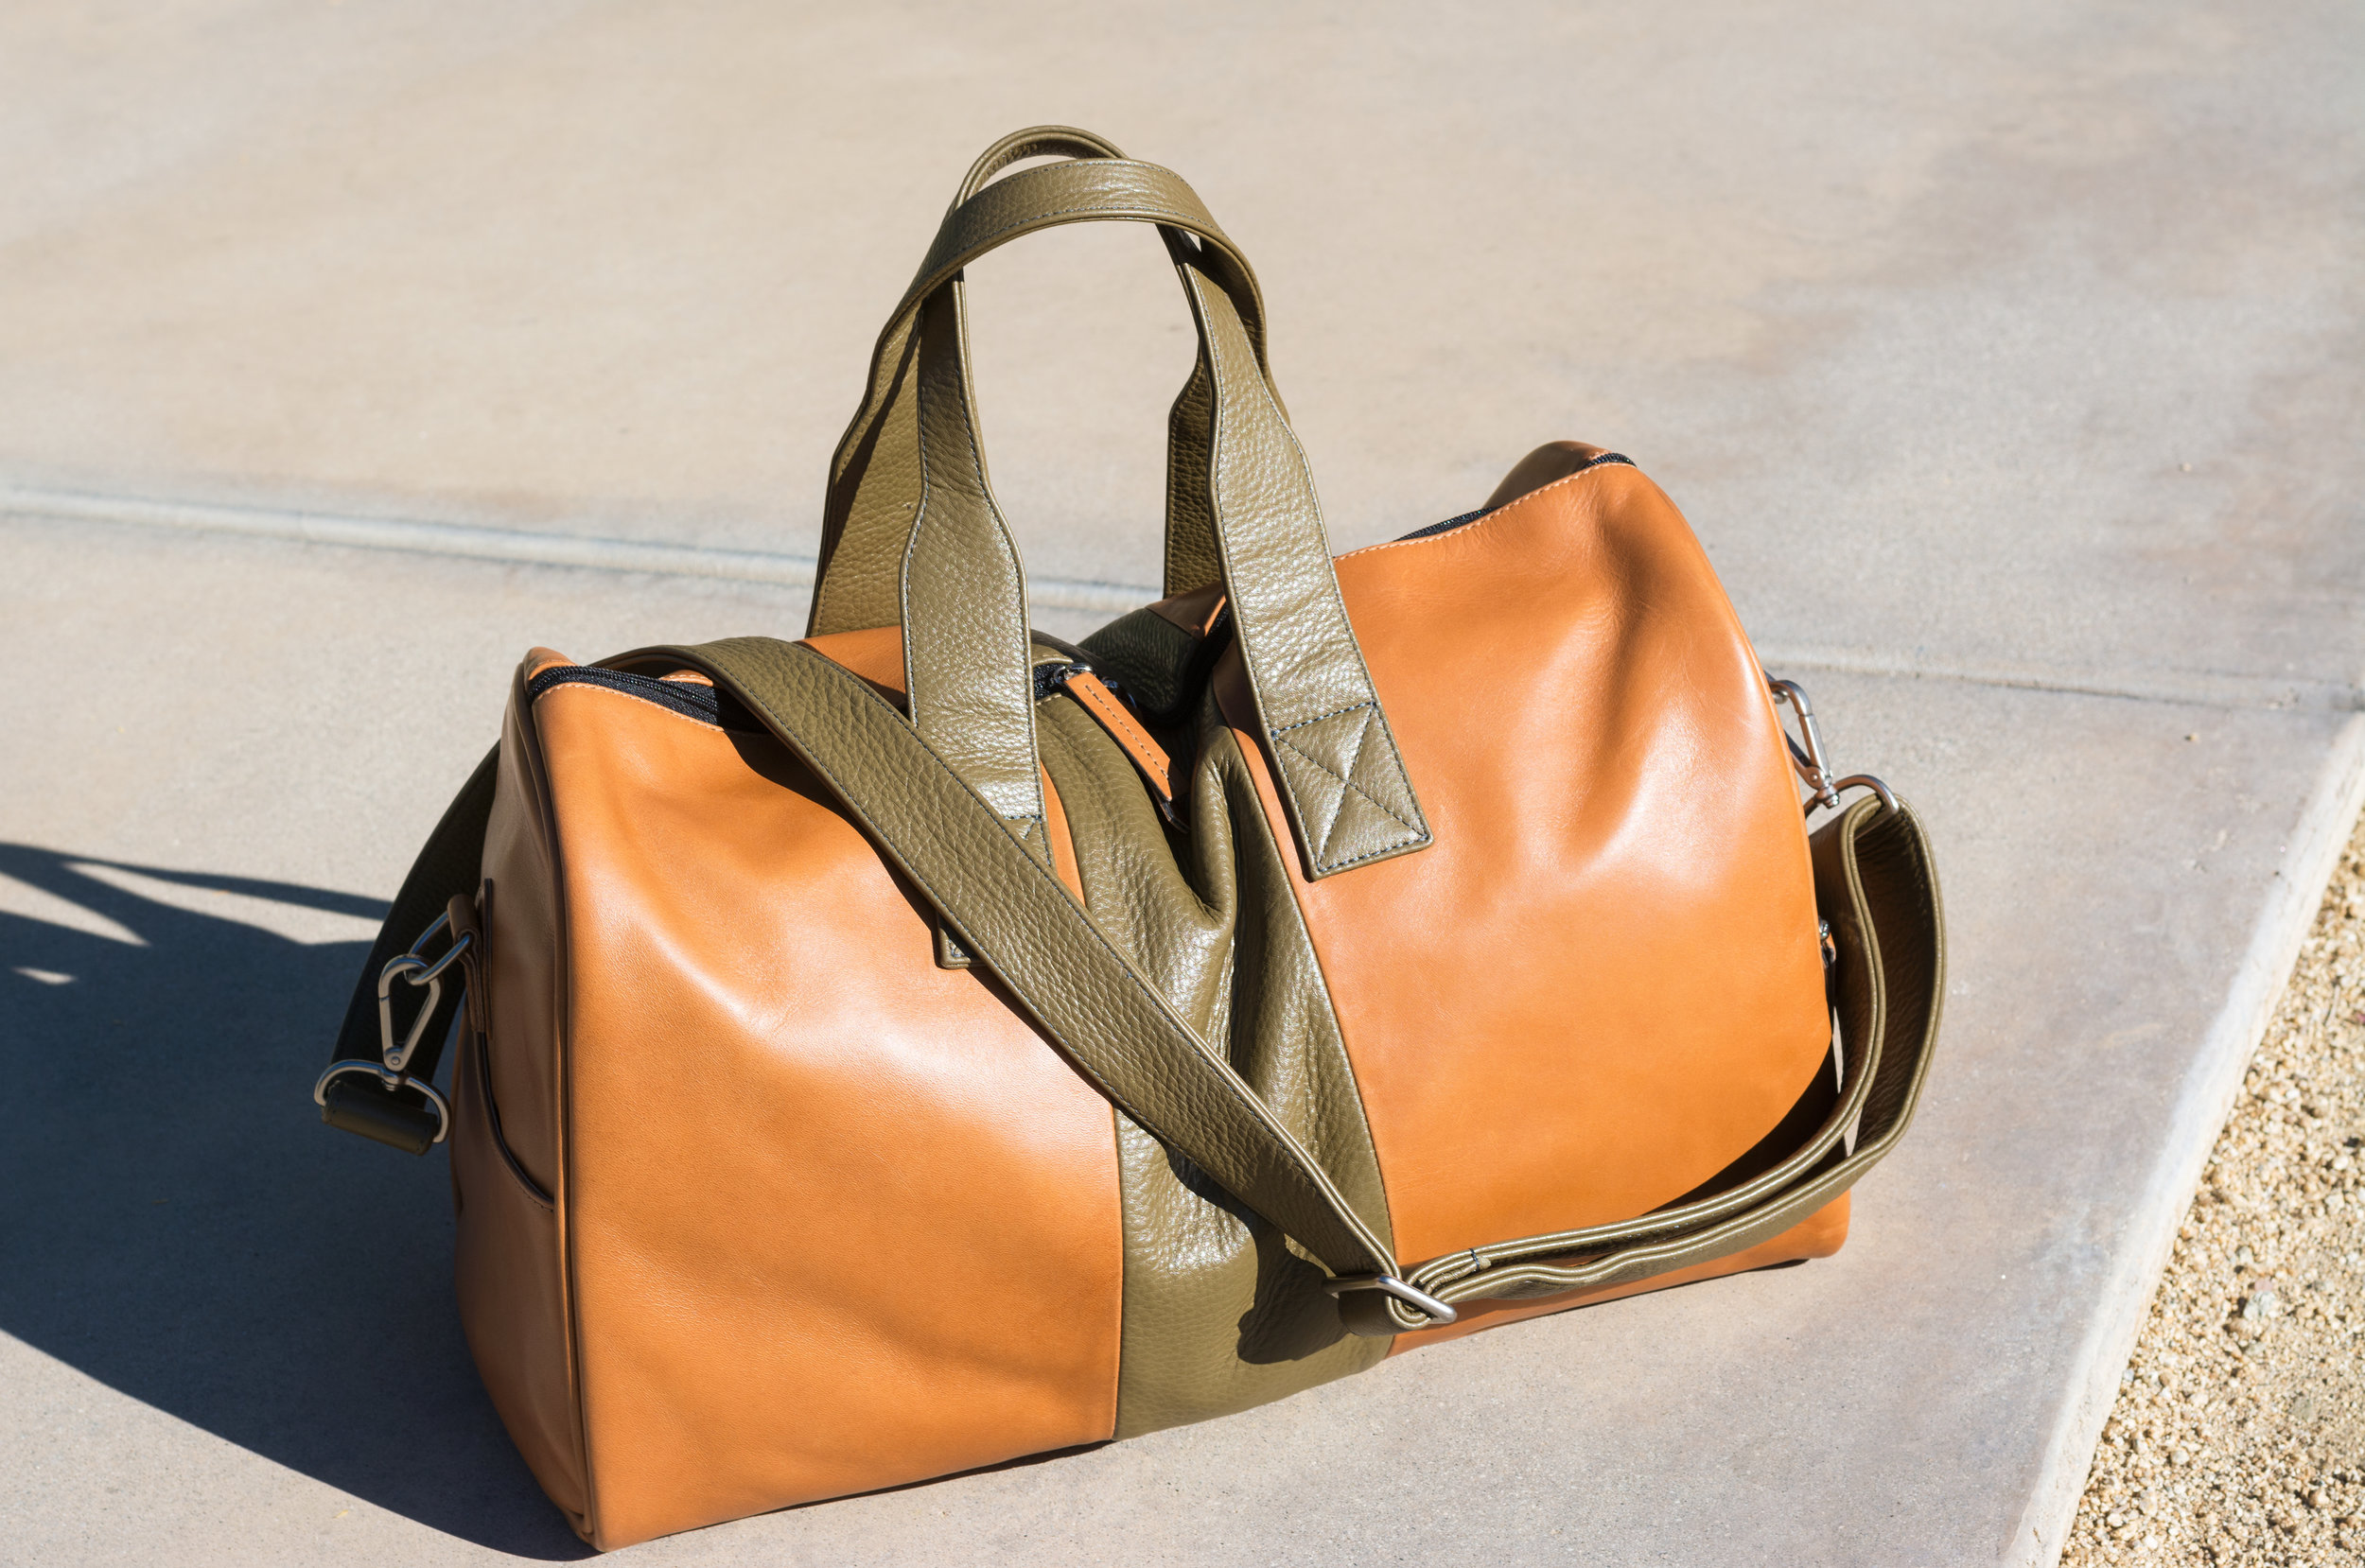 Custom leather duffel bag by Laudi Vidni | The Modern Otter